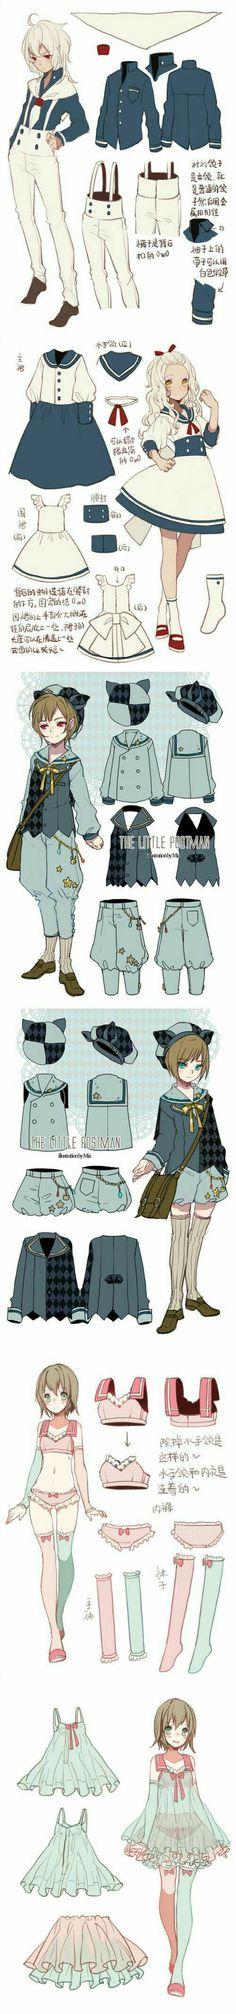 Drawing Anime Poses Artworks Ideas For 2020 Character Design Cartoon, Character Design References, Character Design Inspiration, Character Reference, Drawing Reference, Manga Clothes, Drawing Clothes, Design Alien, Estilo Lolita